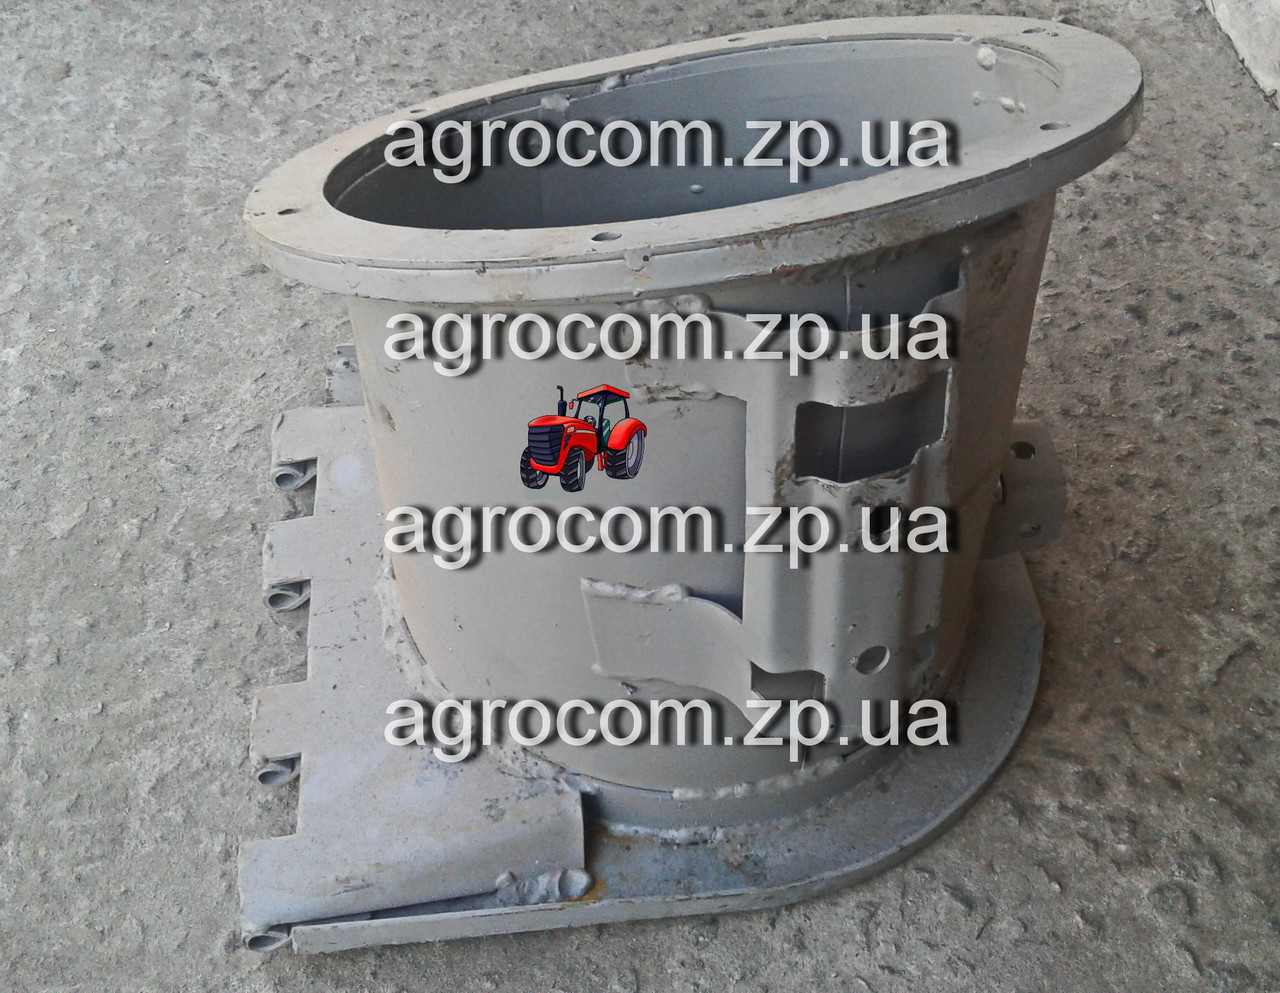 Патрубок выгрузного шнека 54-6-3-2Б СК-5 Нива